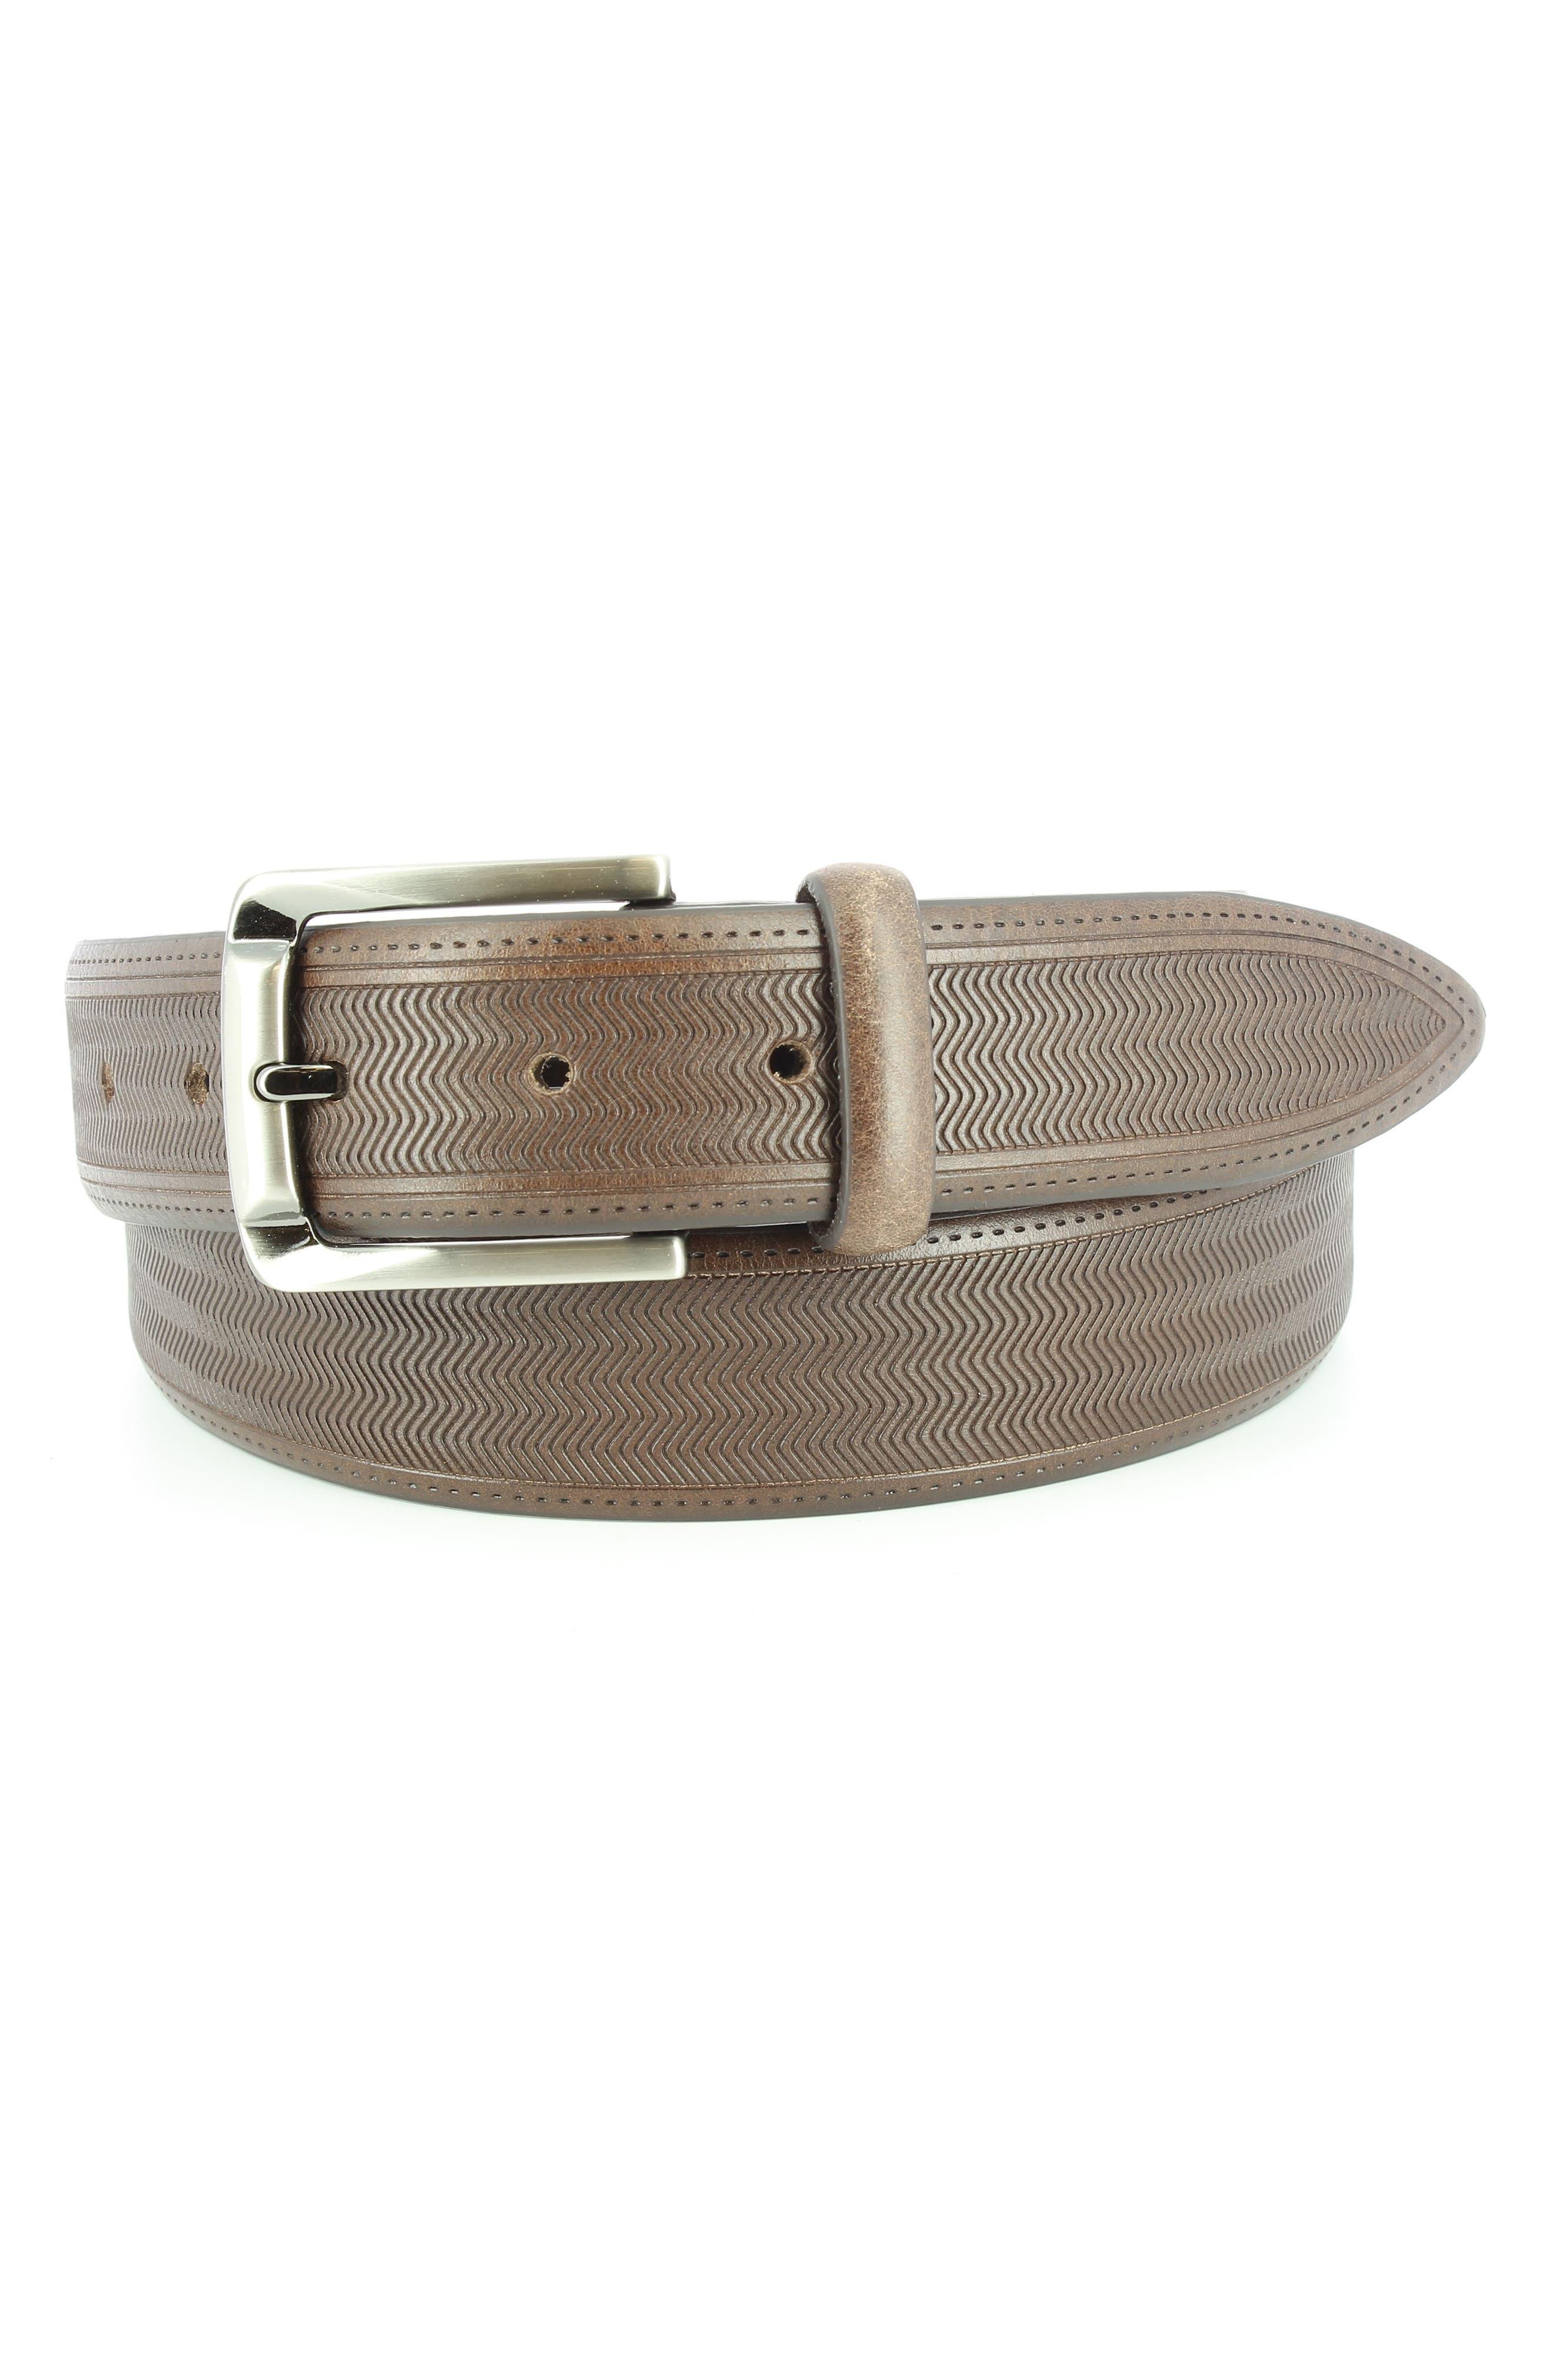 Raspail Leather Belt,                             Main thumbnail 1, color,                             BROWN